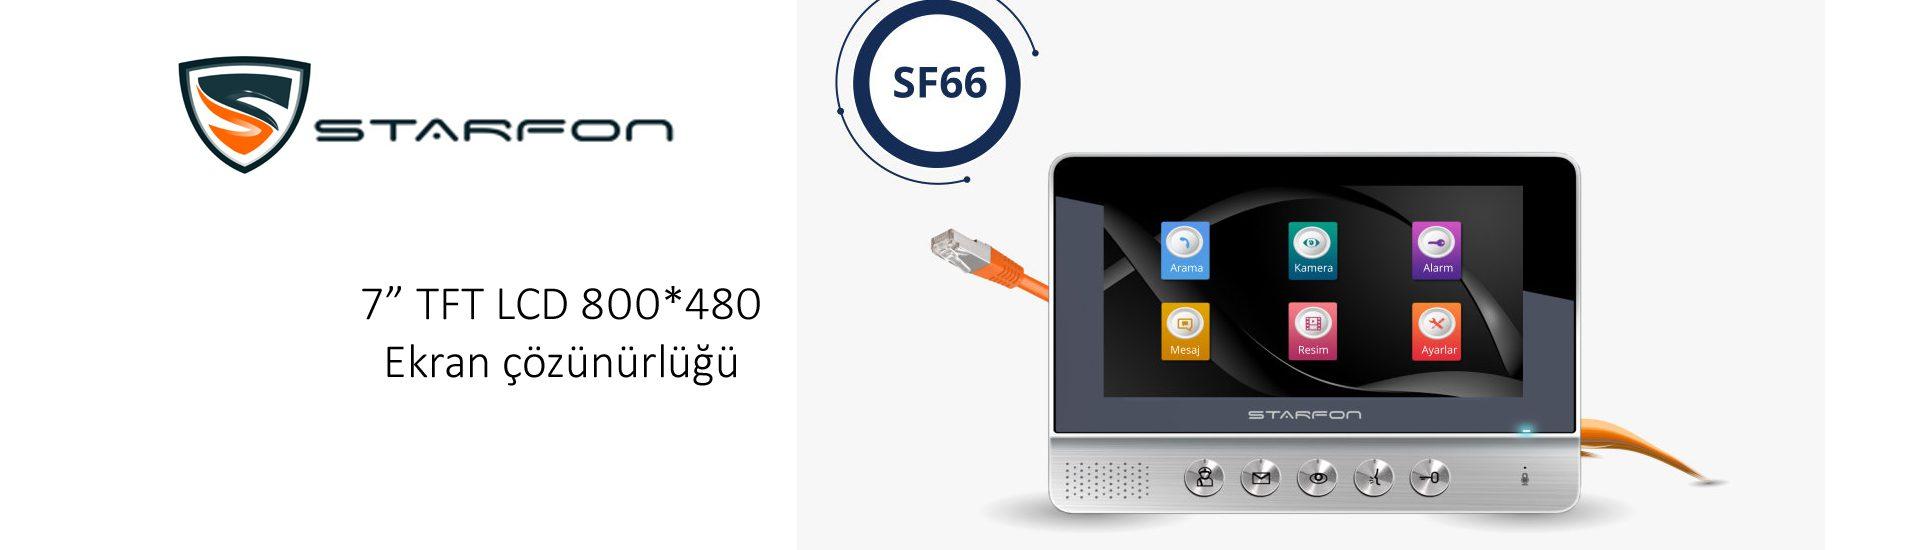 SF 66